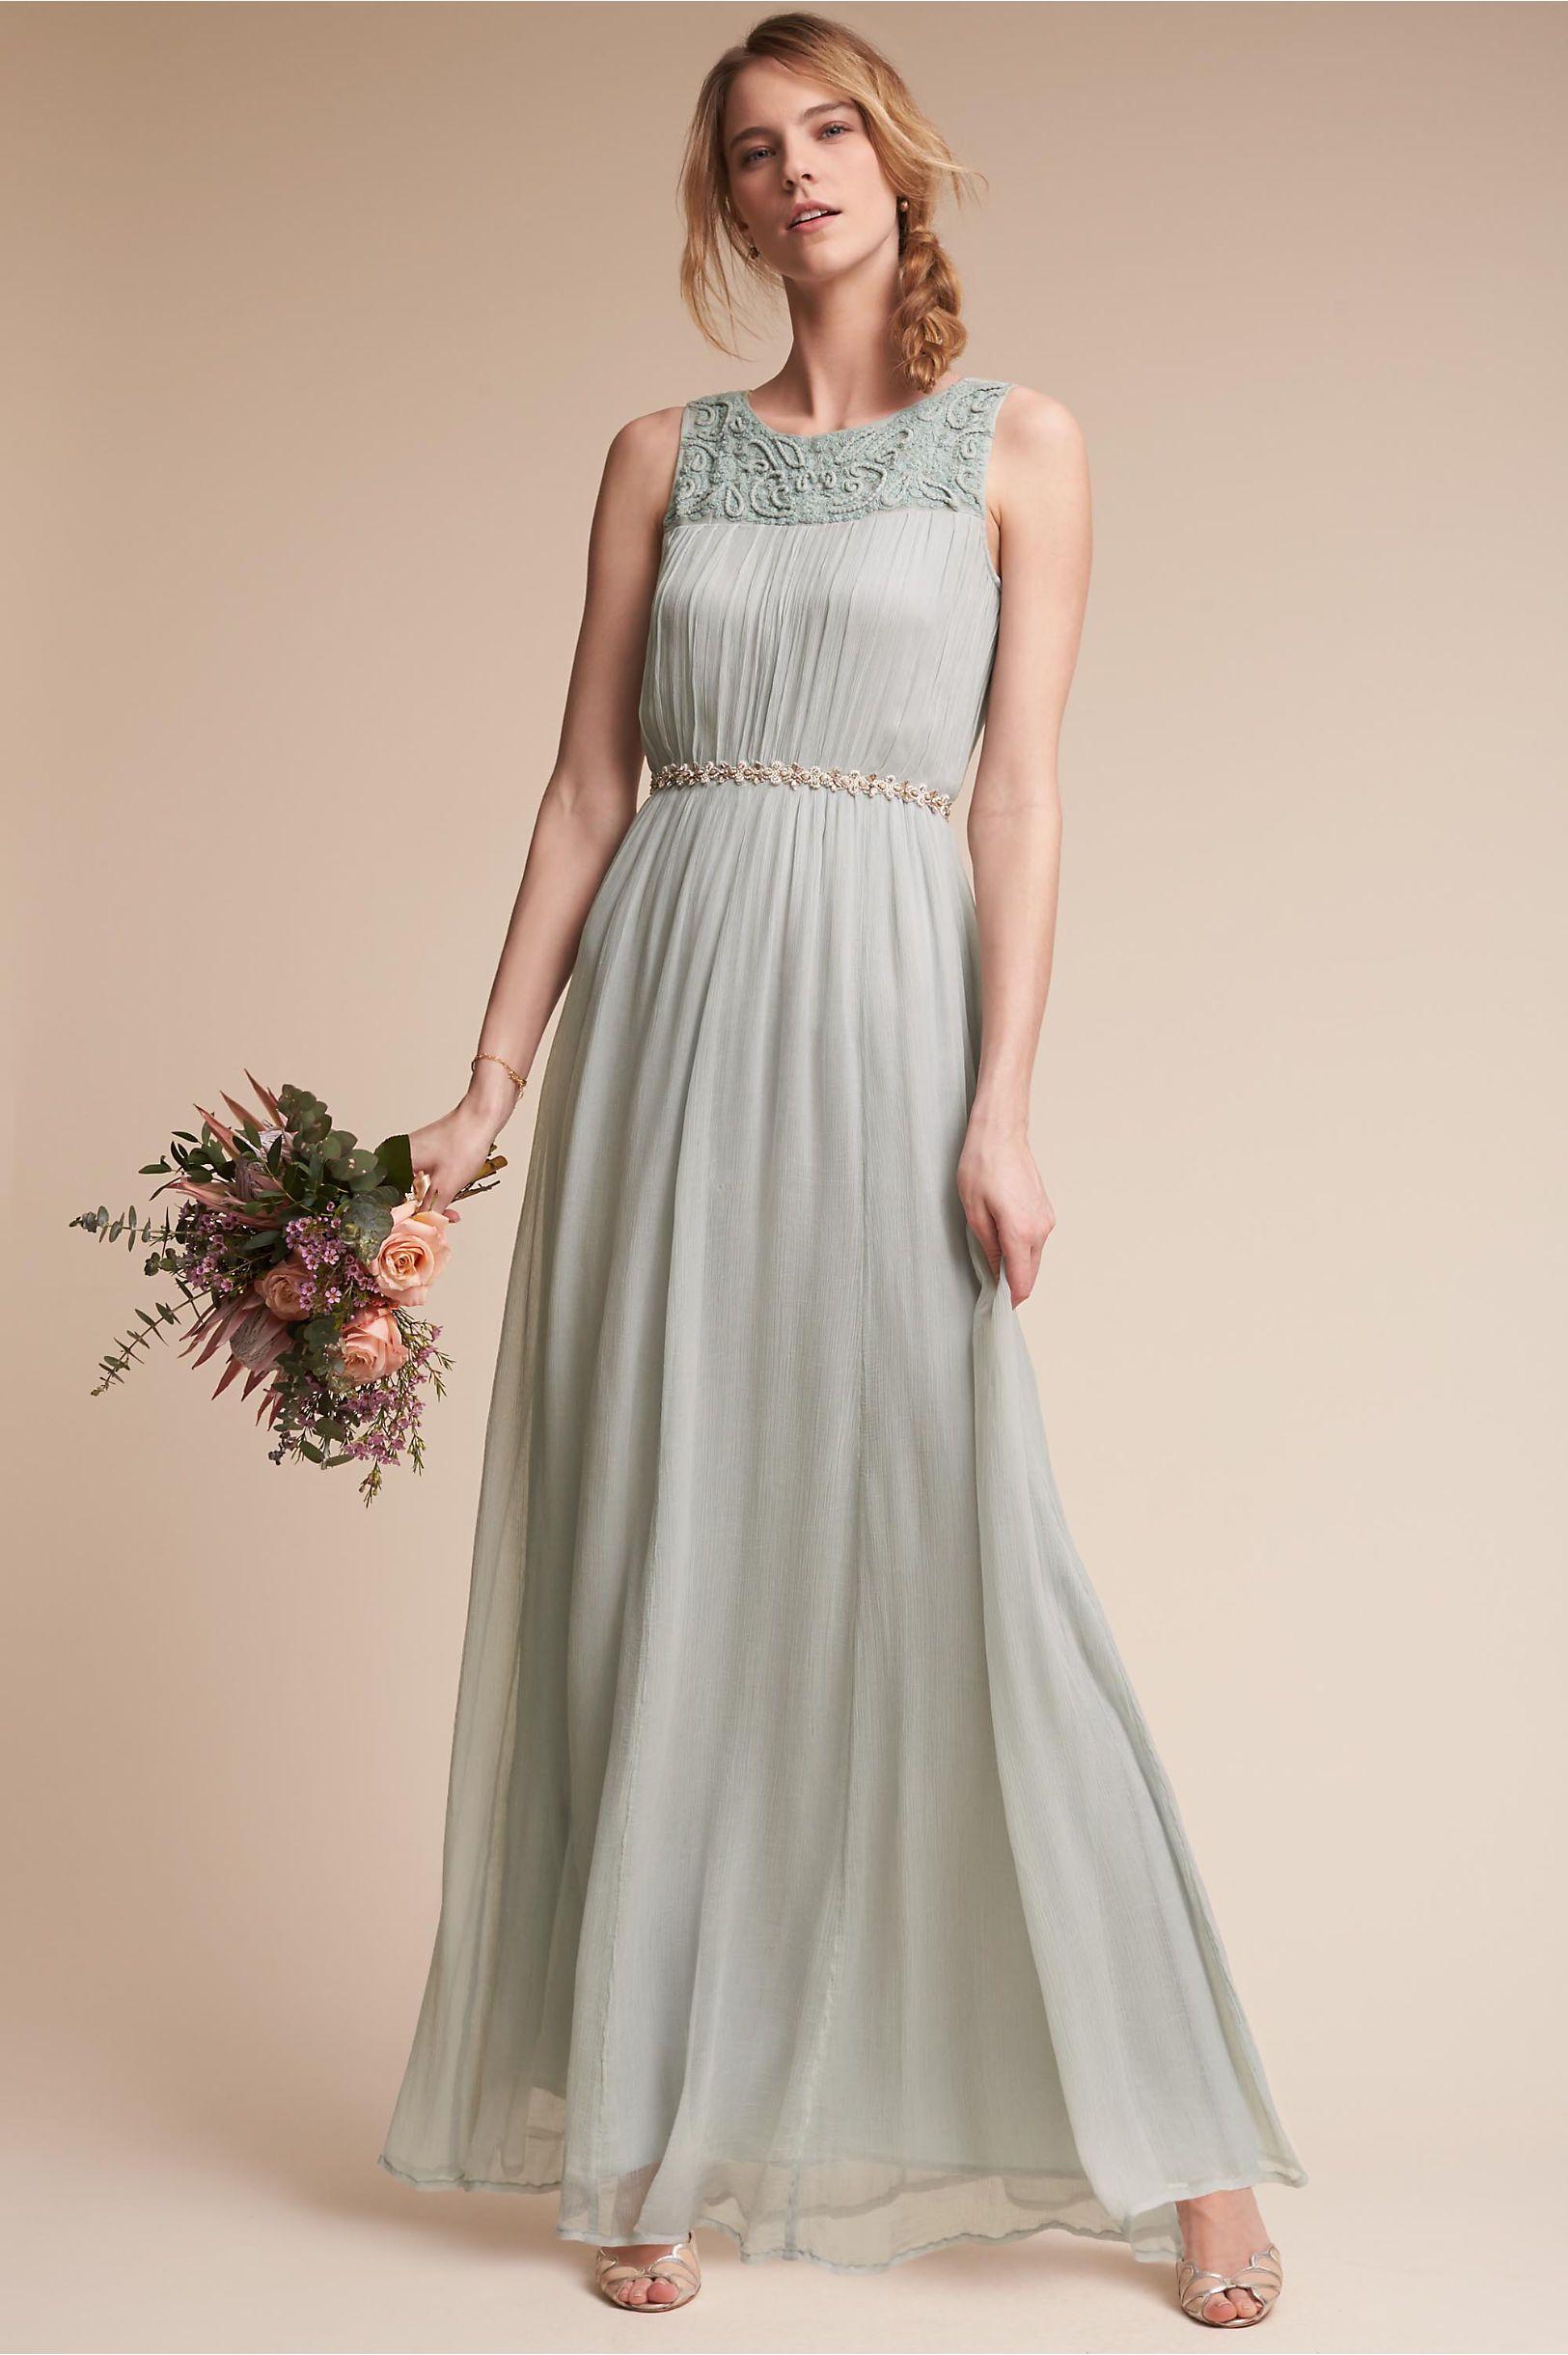 3ba2c5ea7439 BHLDN Jayne Dress in Bridal Party Bridesmaid Dresses